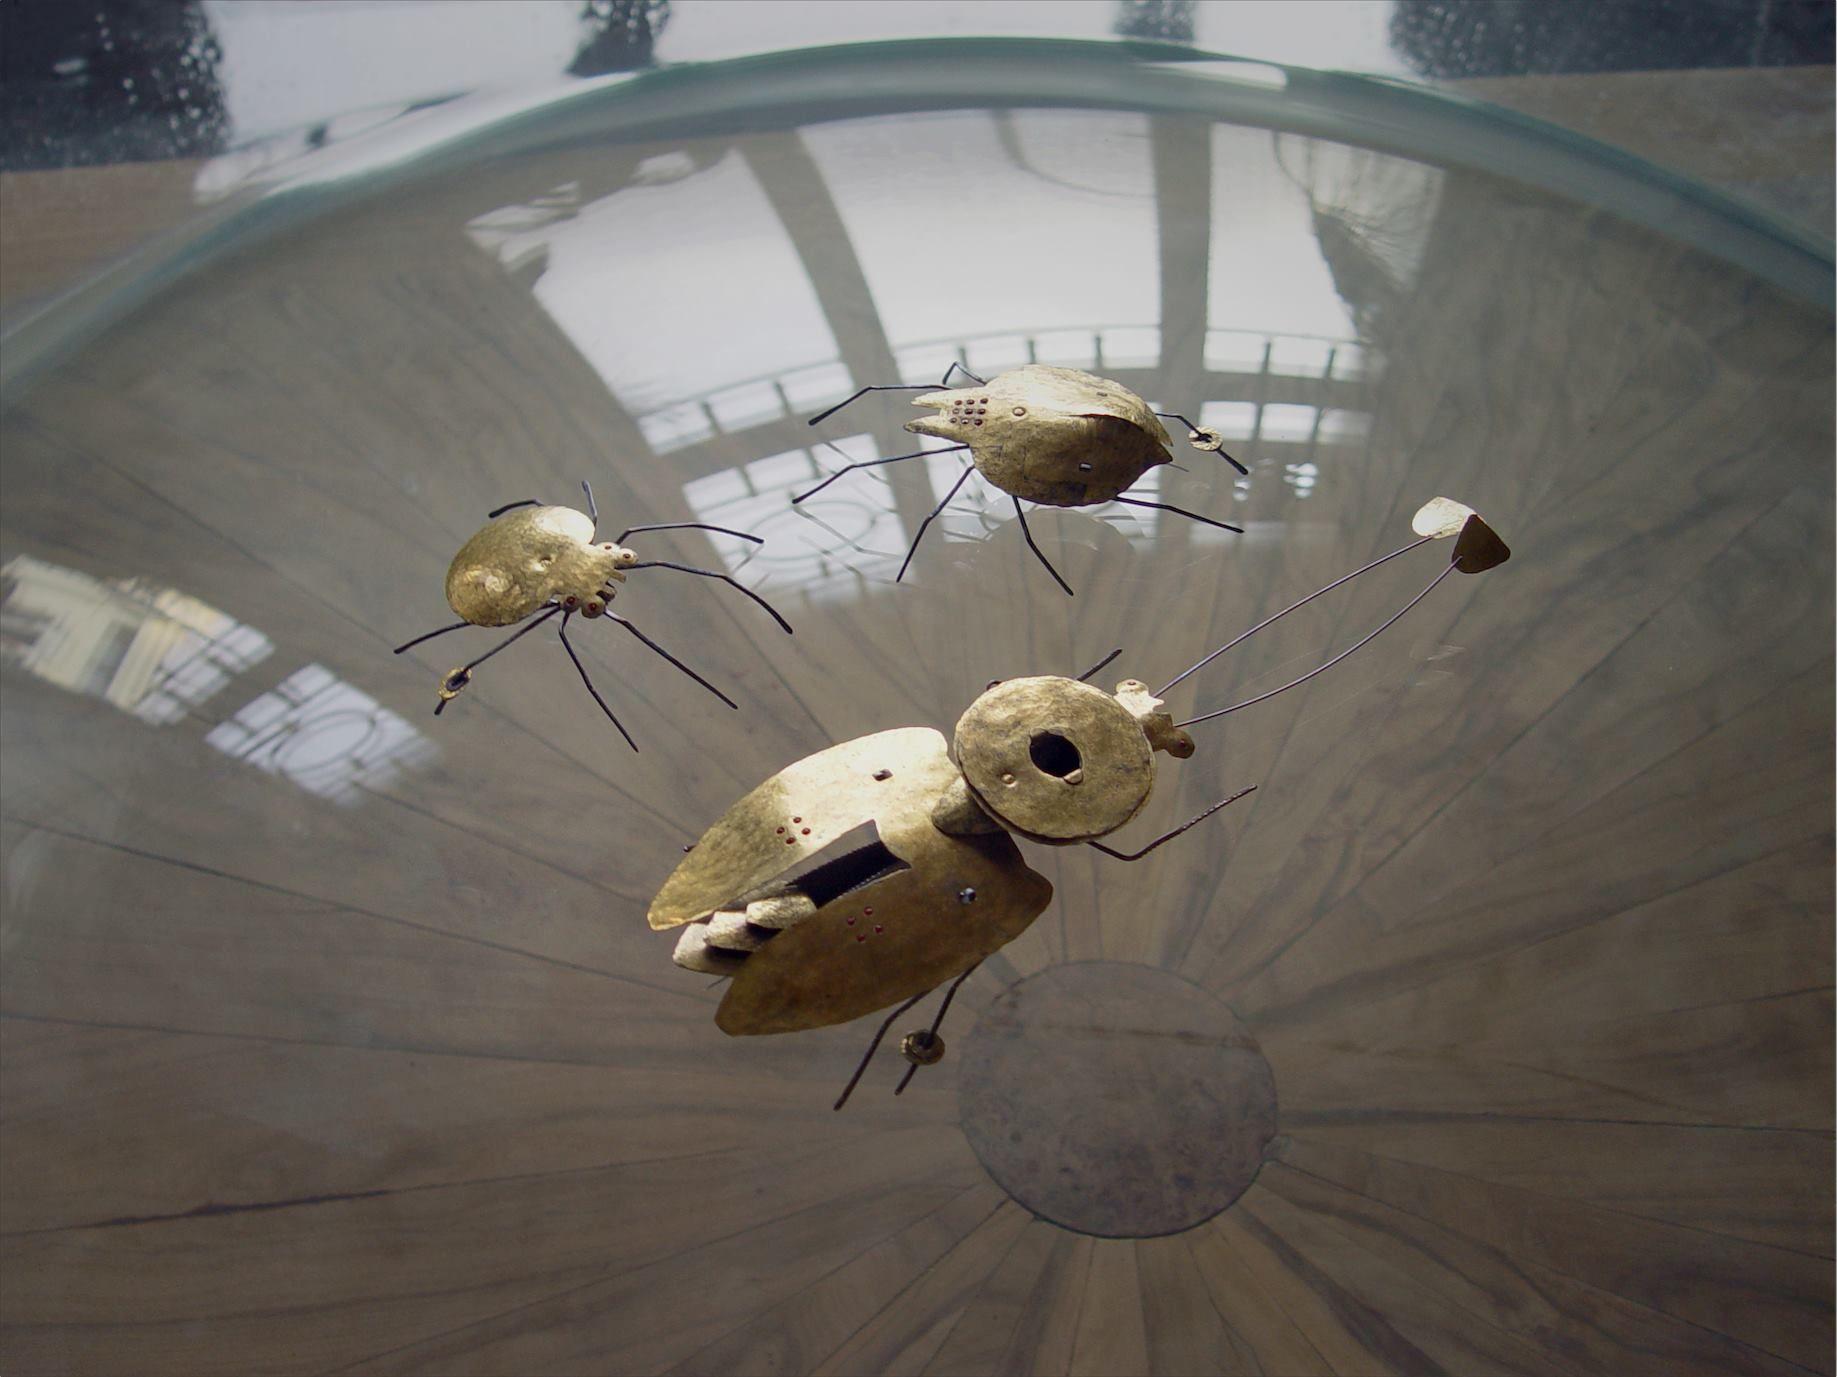 "Jura Golub - Brooches ""Spiders"" ""Bug""- Titanium, Stainless Steel, Gold, Glass Beads (Keum Boo, PUK welding) #titanium #gold #keumboo #juragolub #stainlessteel #handmade #unique"